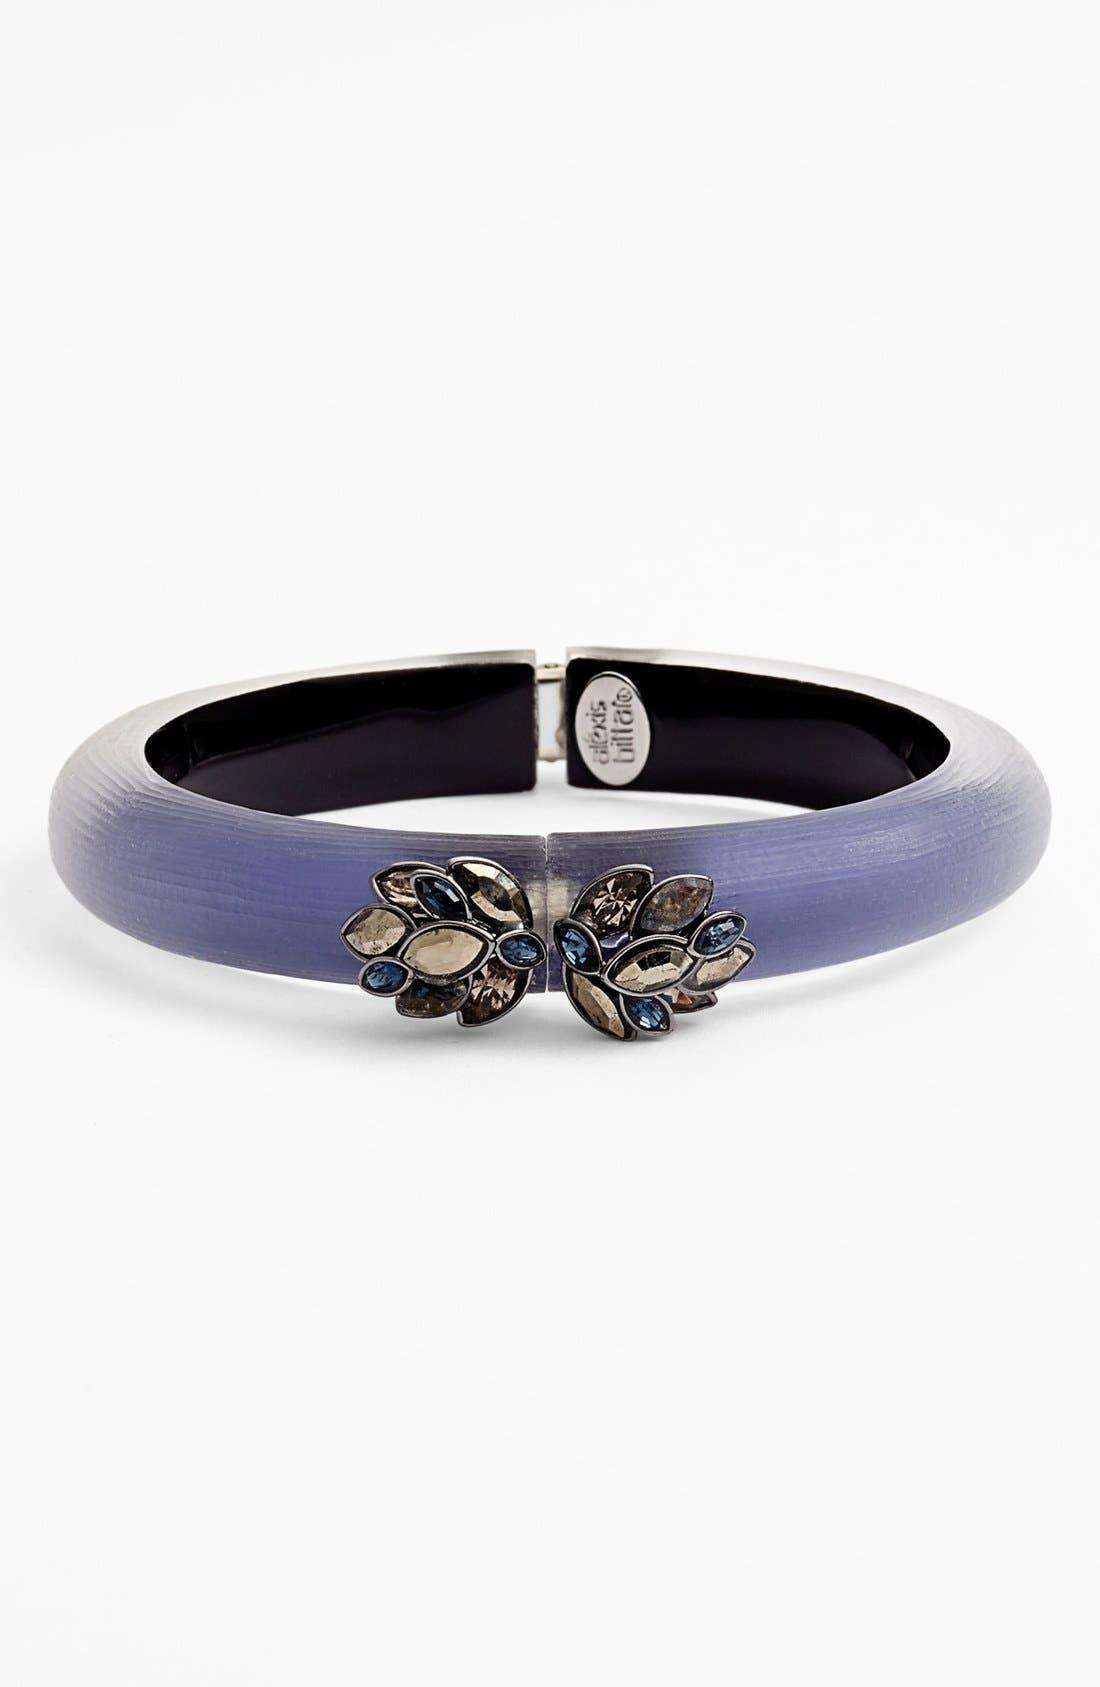 Main Image - Alexis Bittar 'Lucite® - Neo Bohemian' Small Hinged Bracelet